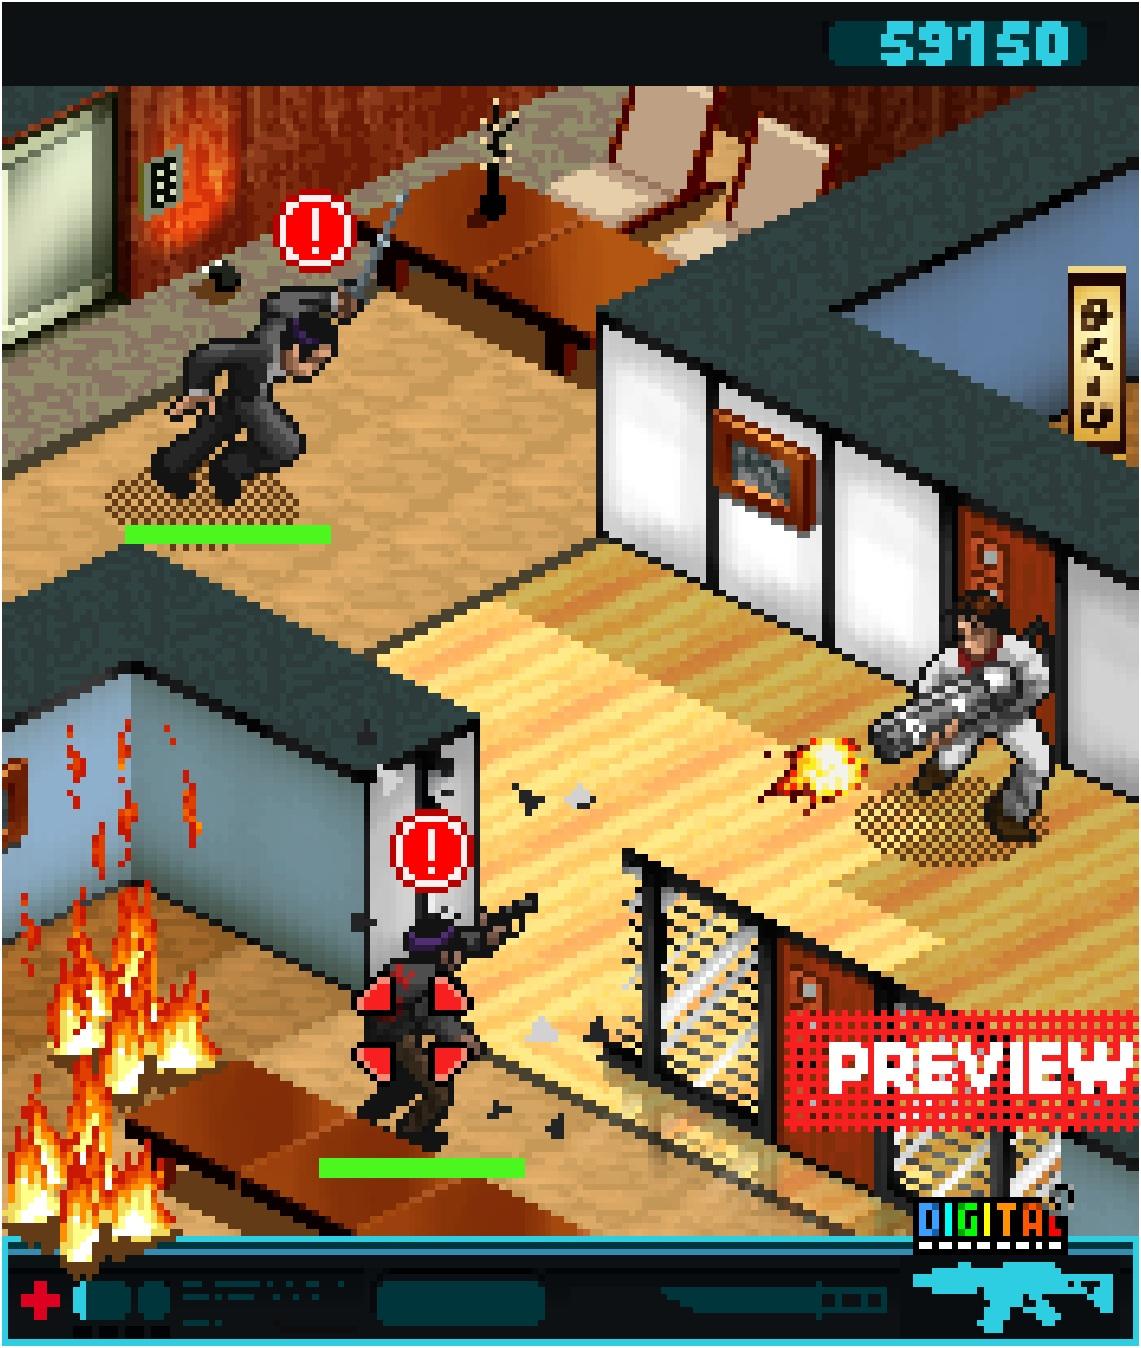 Battle Japanese Yakuza as Mafia Wars goes East